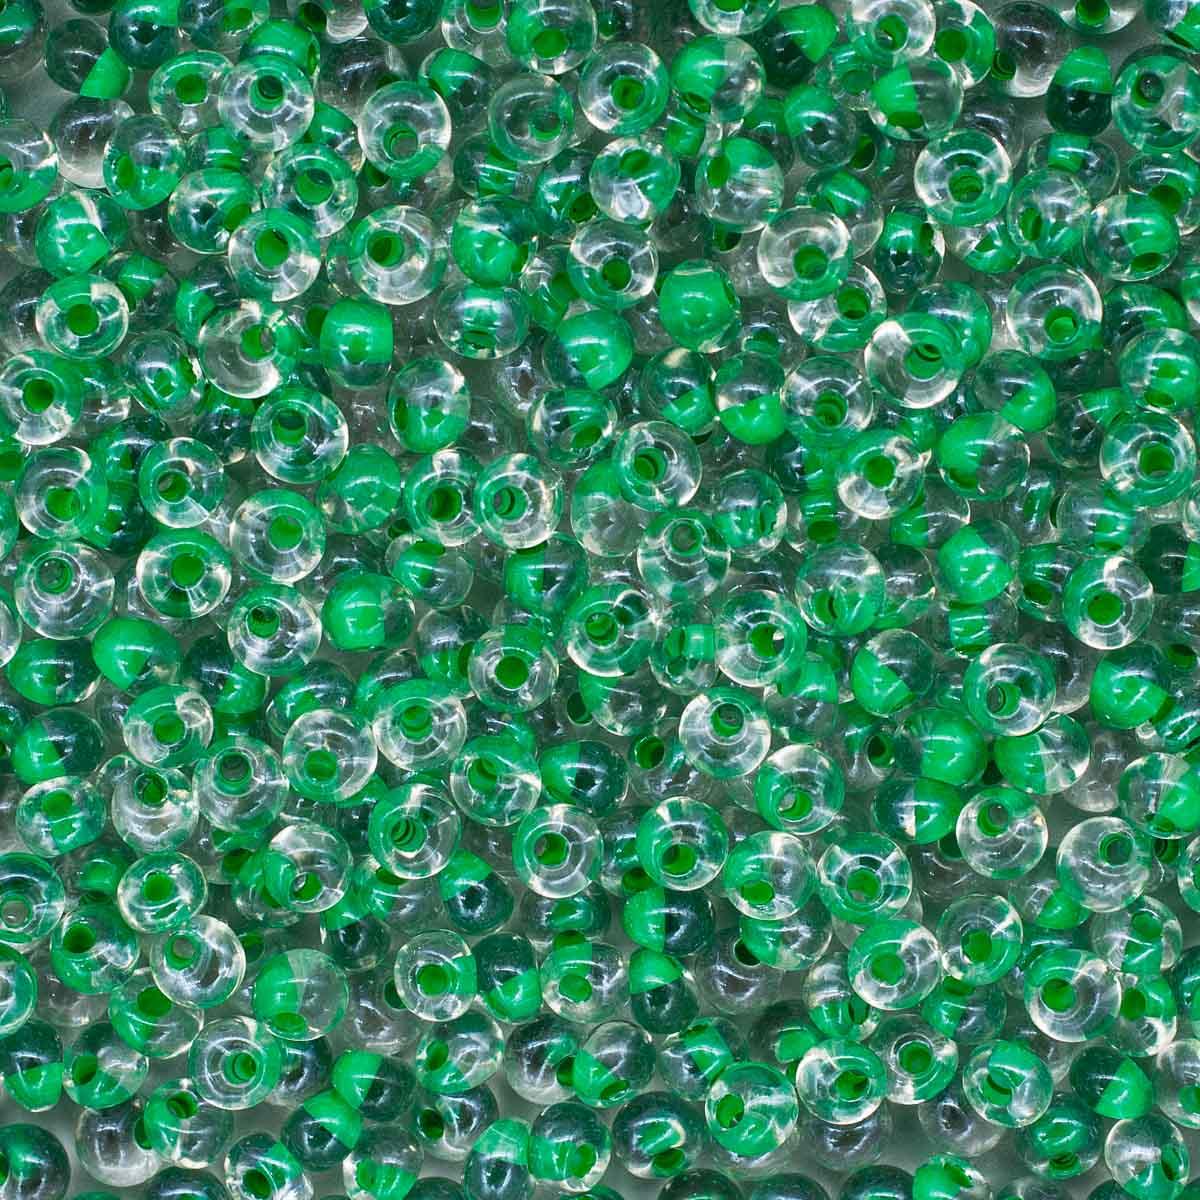 Бисер Drops 5/0 (~4,5мм) (38656) прозрачный с цветным центром, 50гр Preciosa